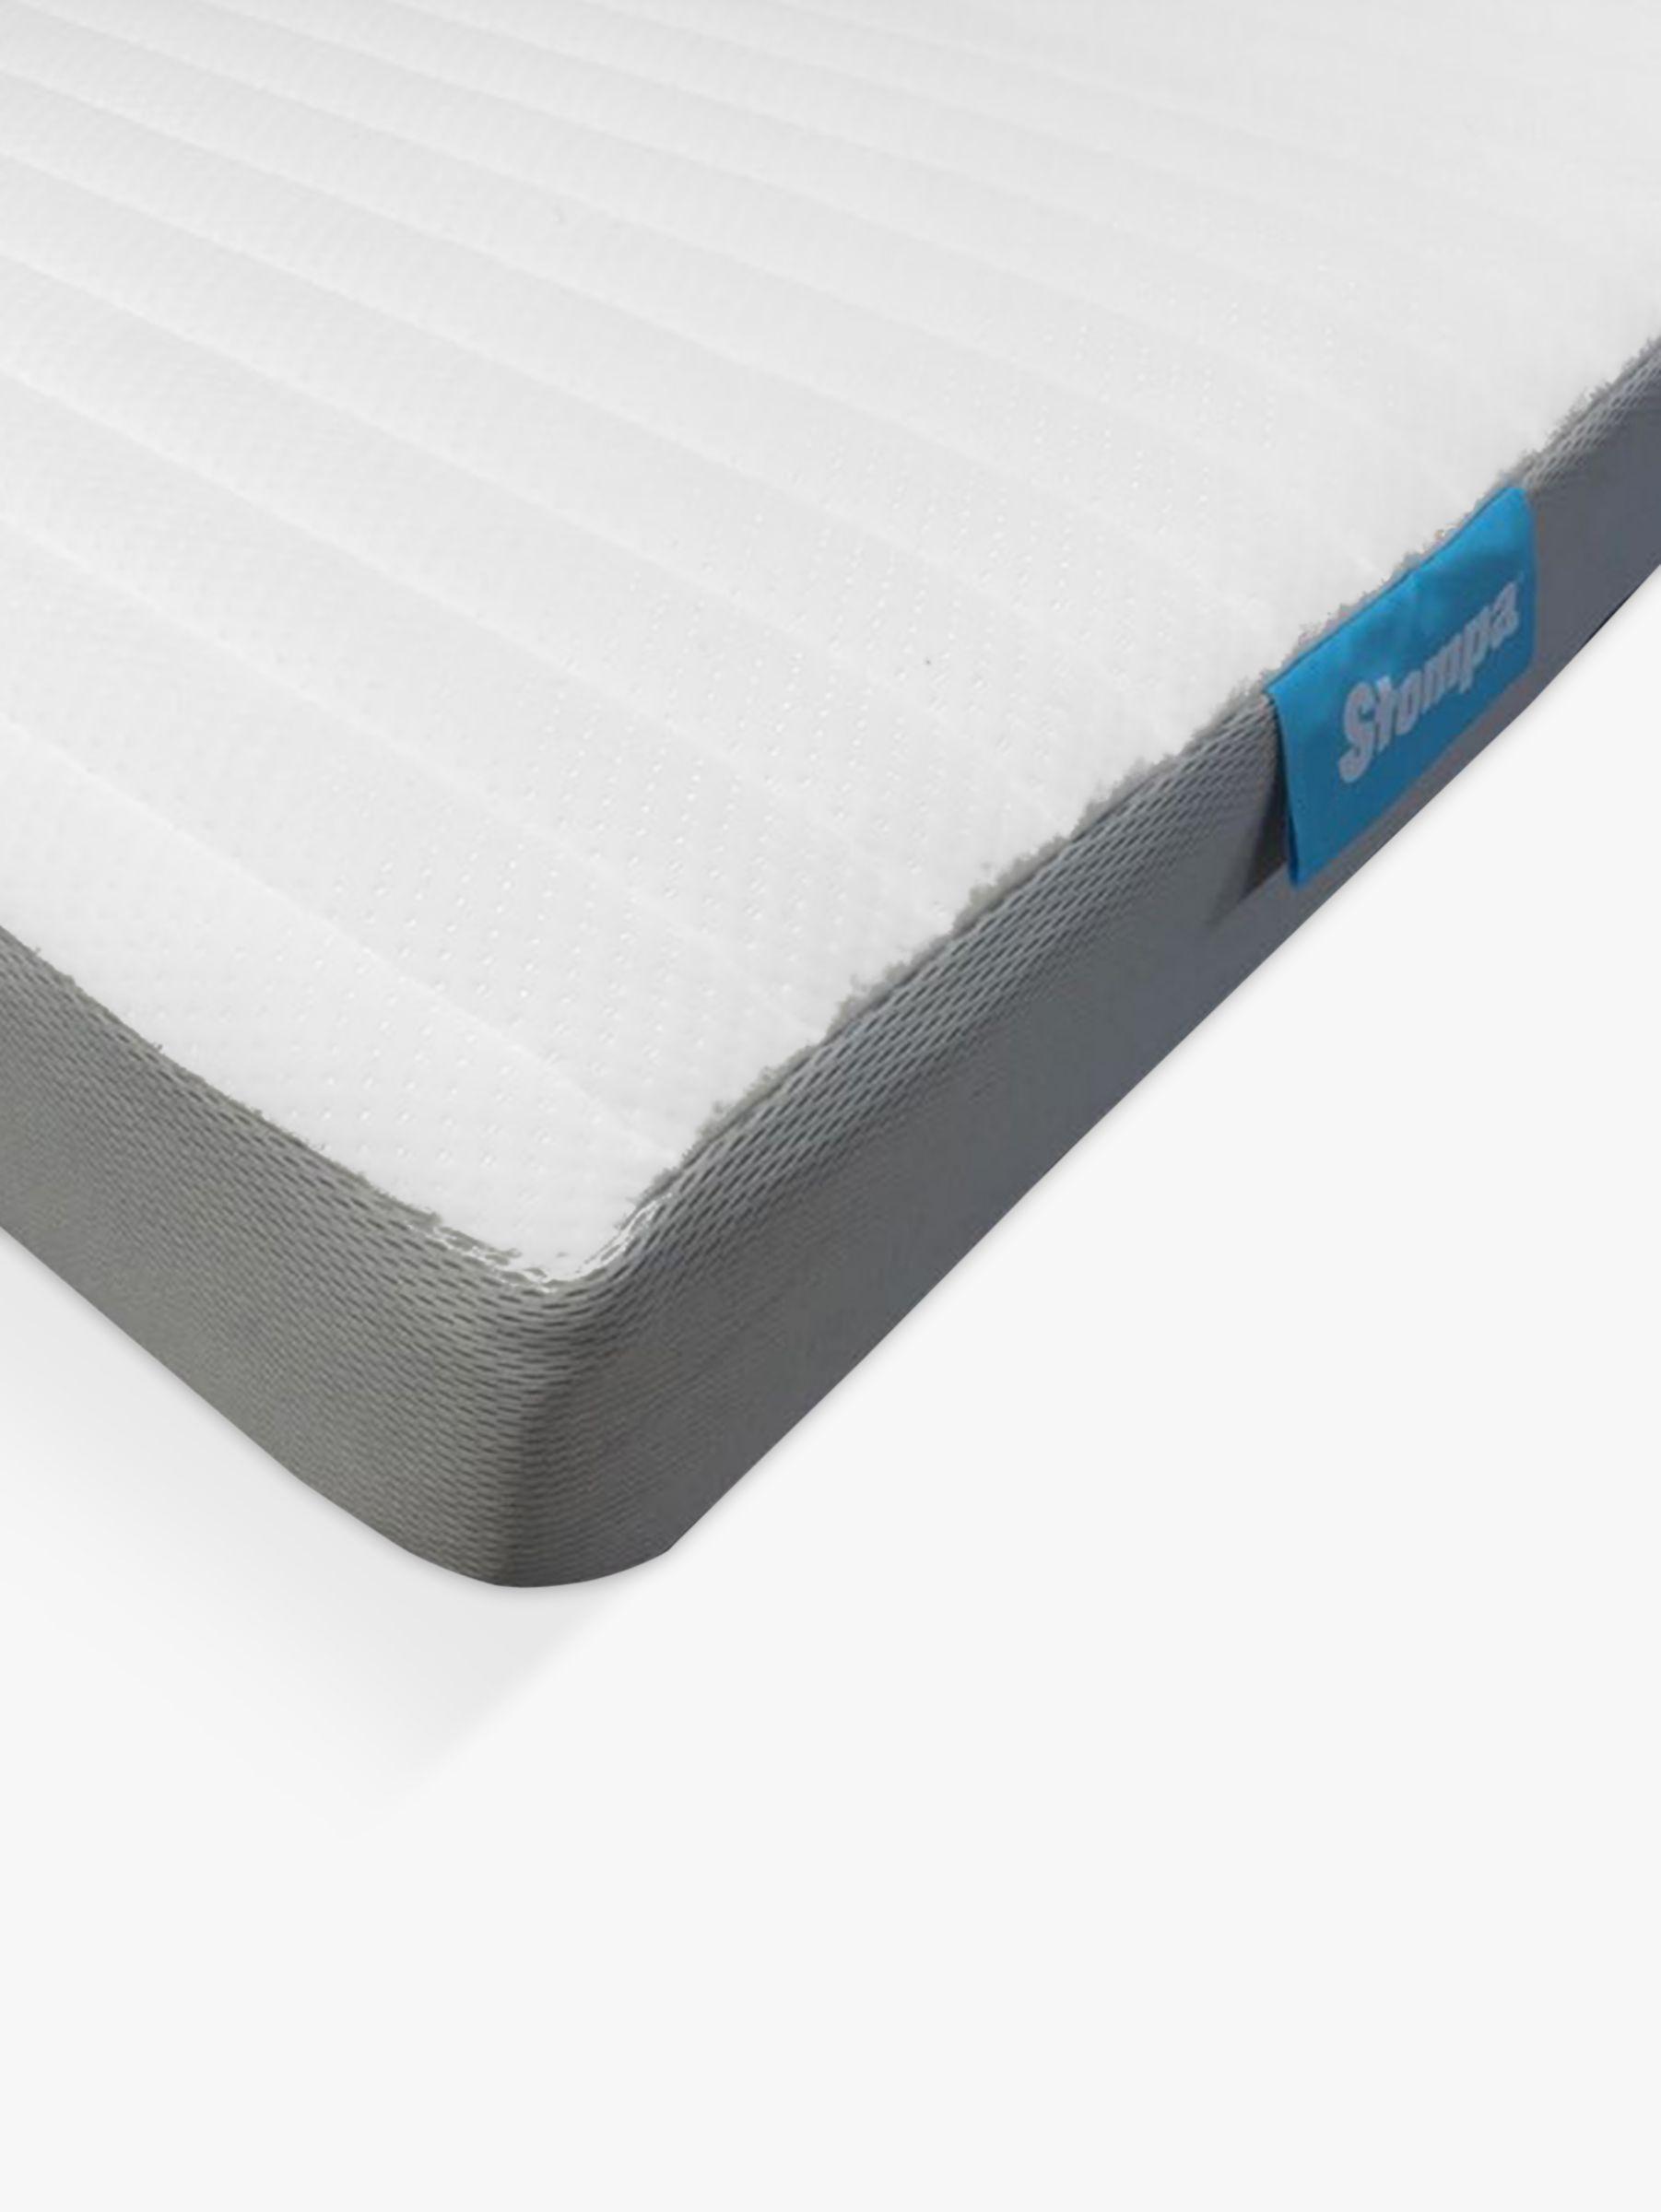 Stompa Stompa S Flex Airflow Foam Mattress, Medium, Single